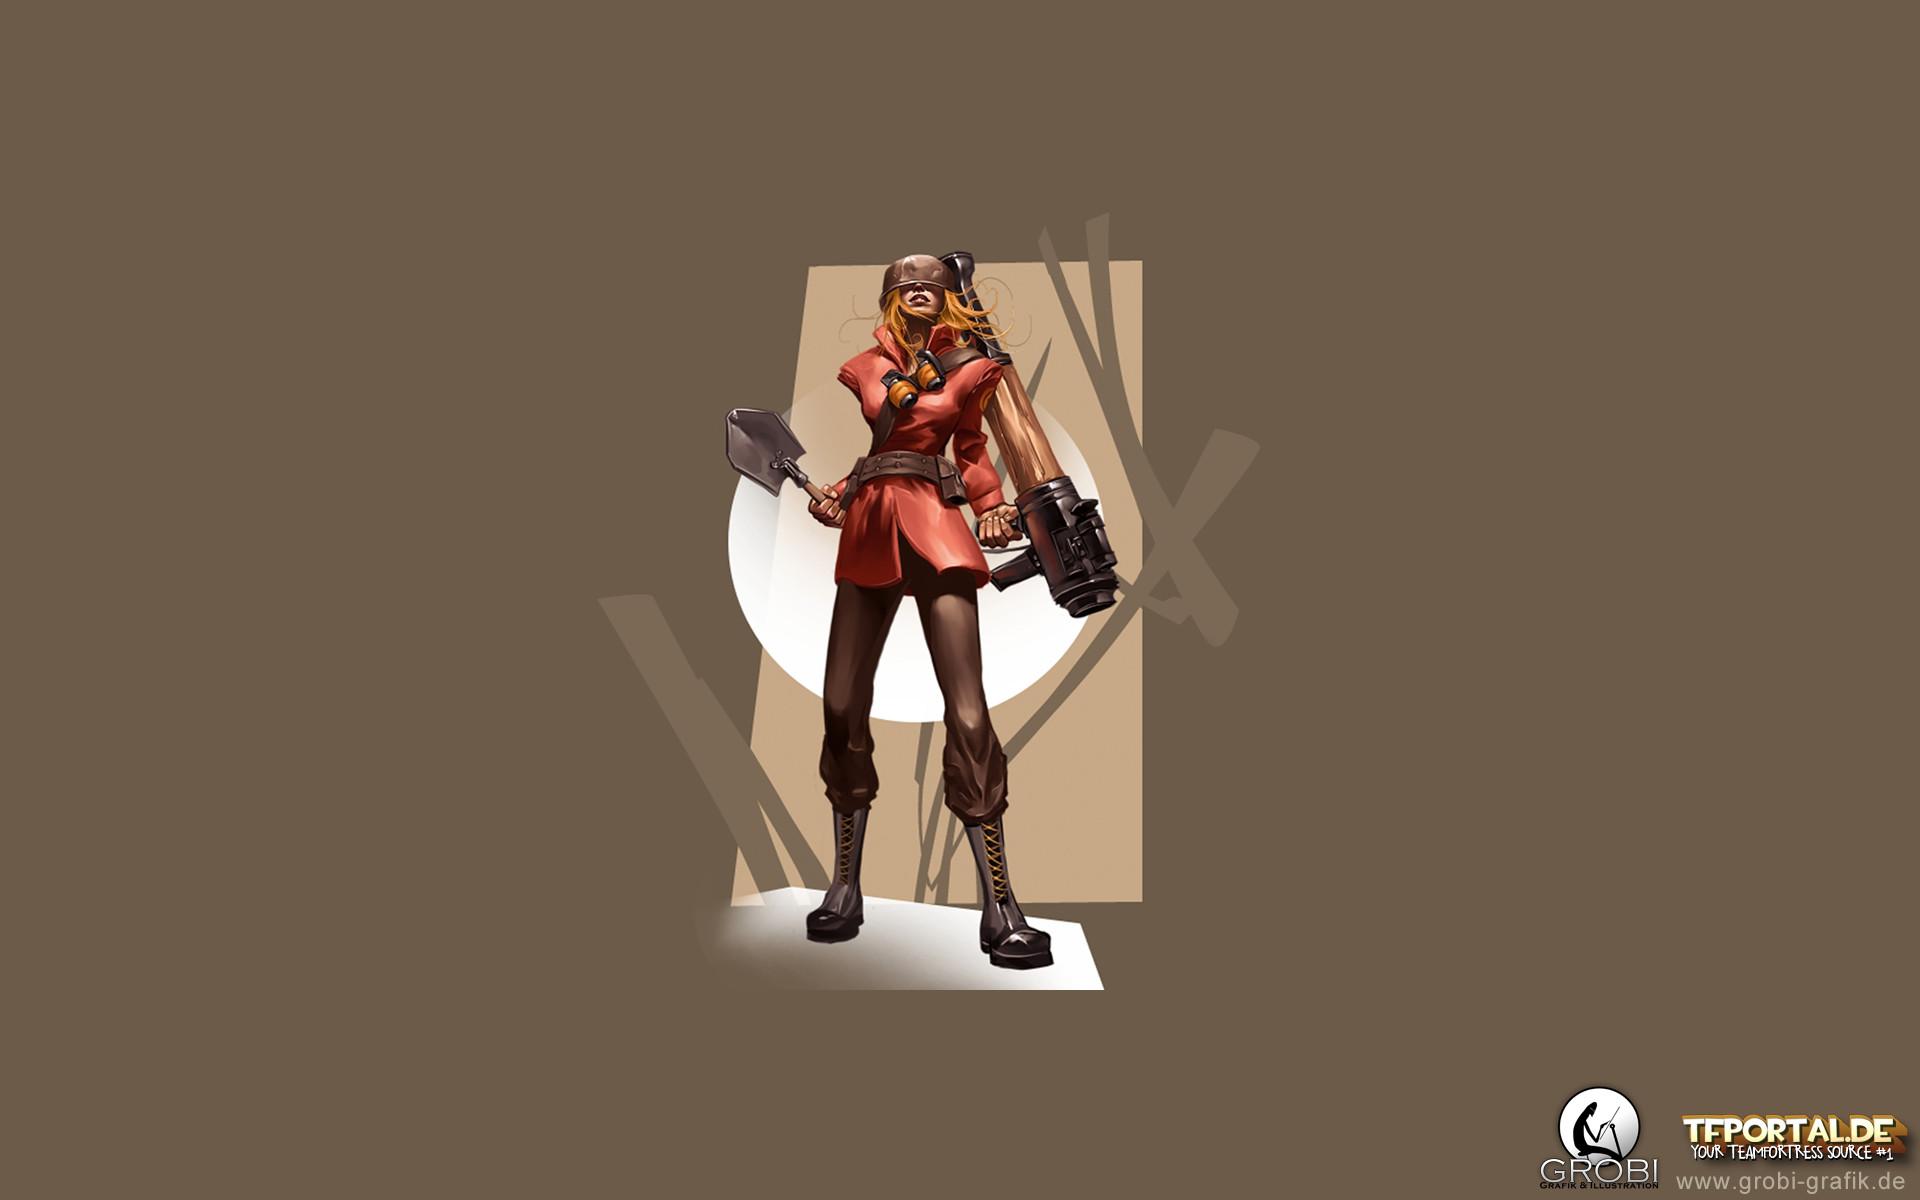 TF2 Girl Soldier Wallpaper. 1920×1080